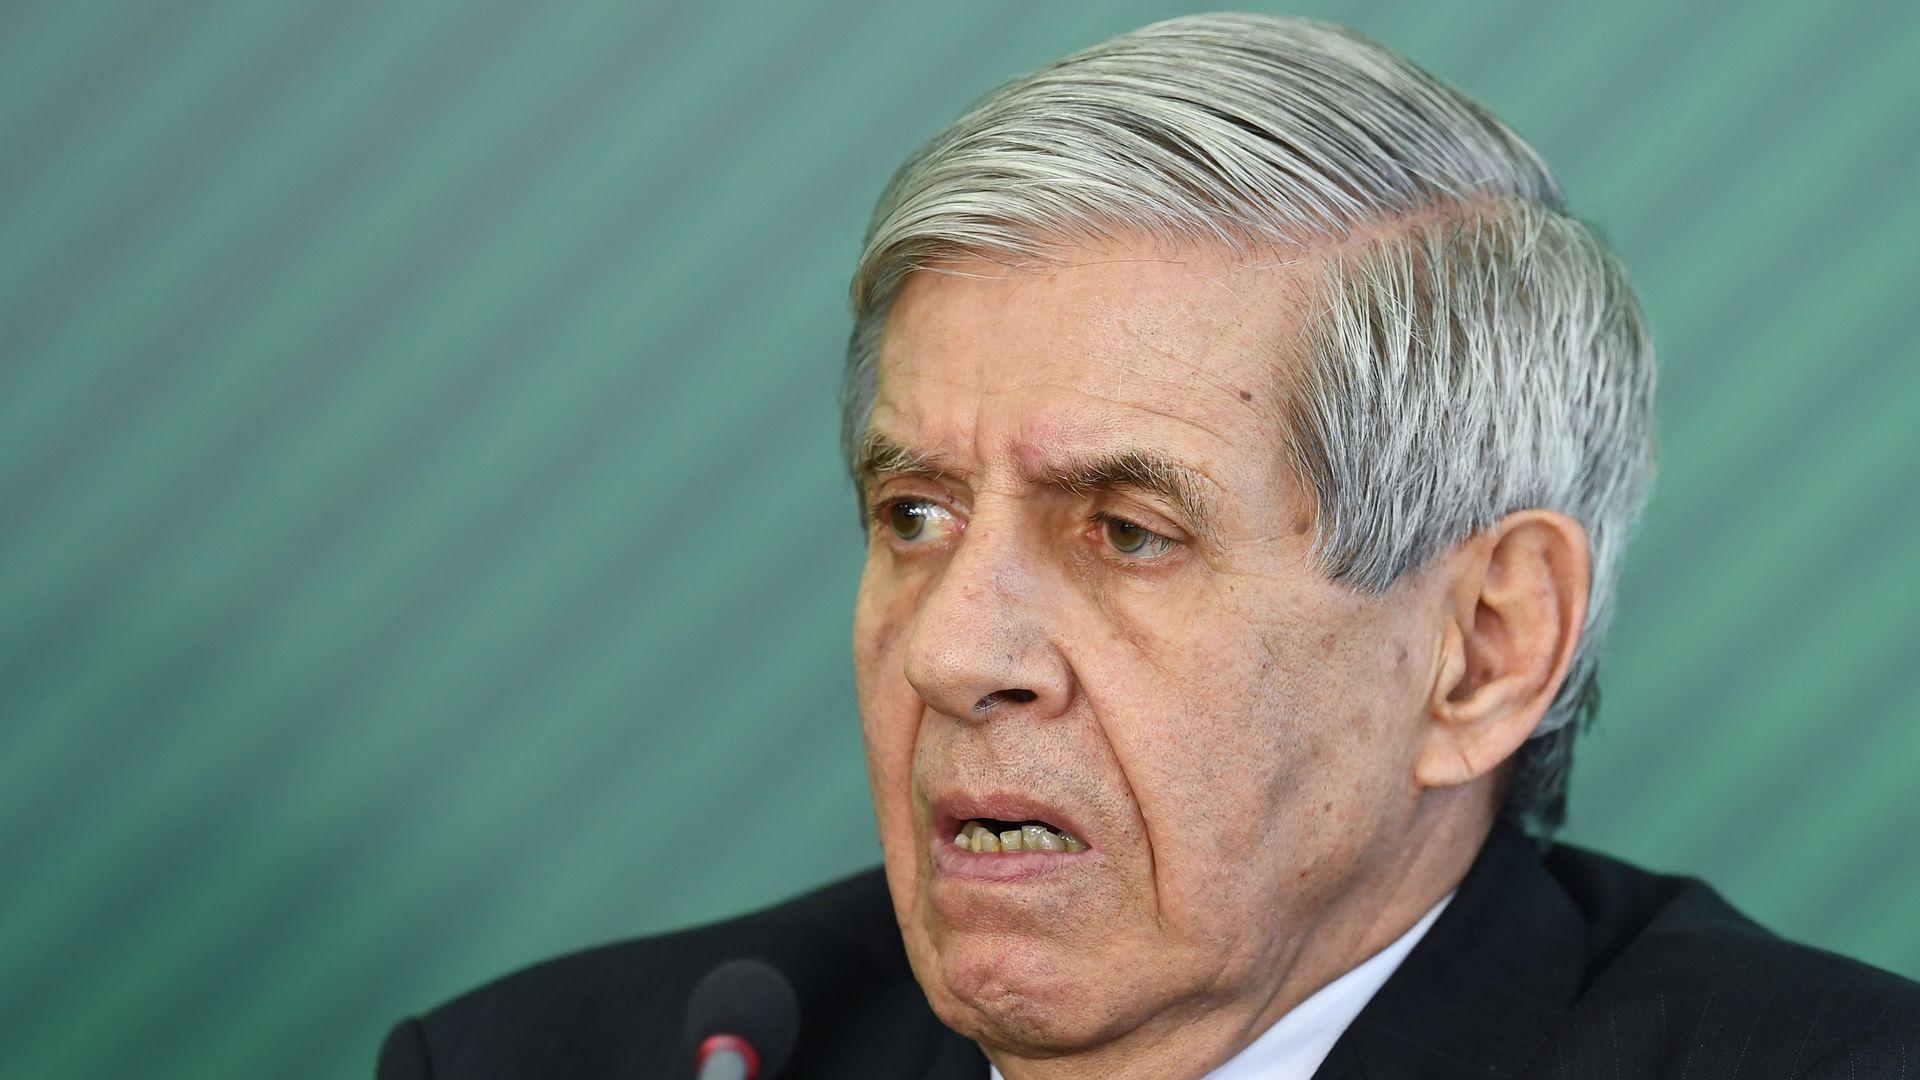 The head of Brazilian defense, Augusto Heleno.